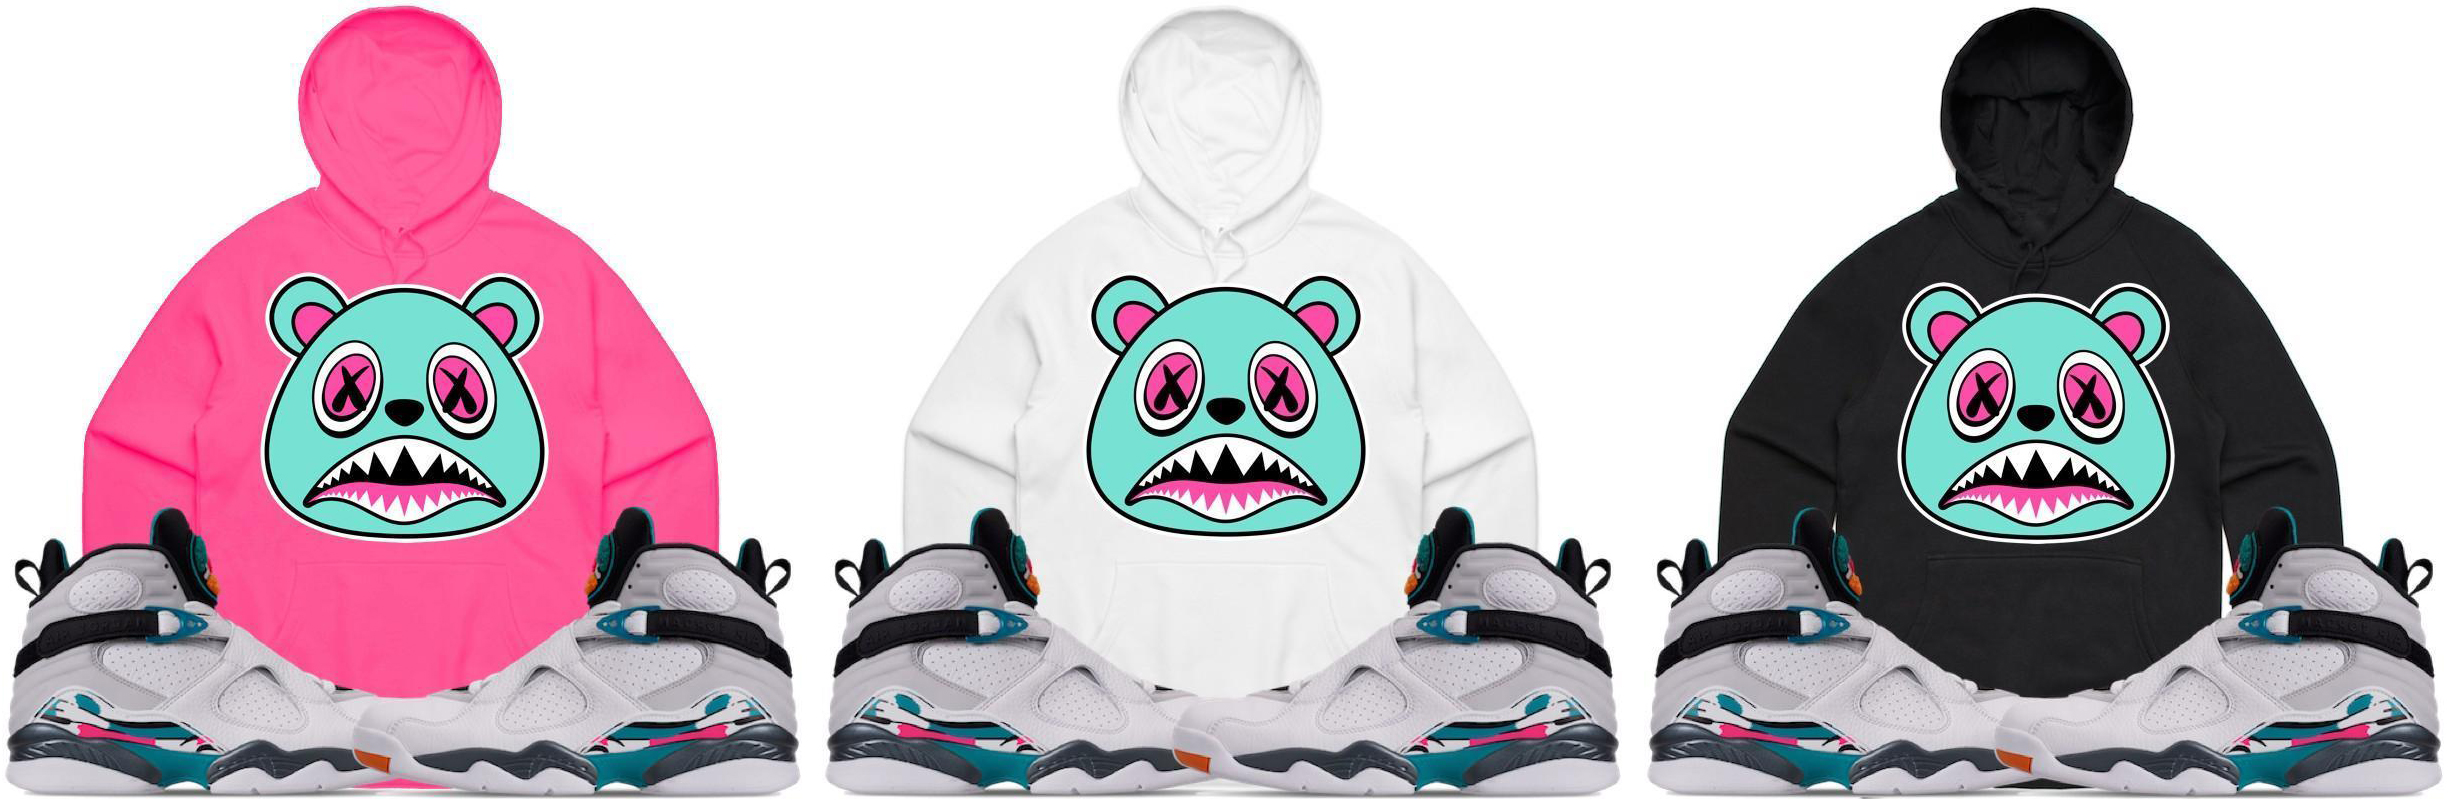 jordan-8-south-beach-baws-hoodies